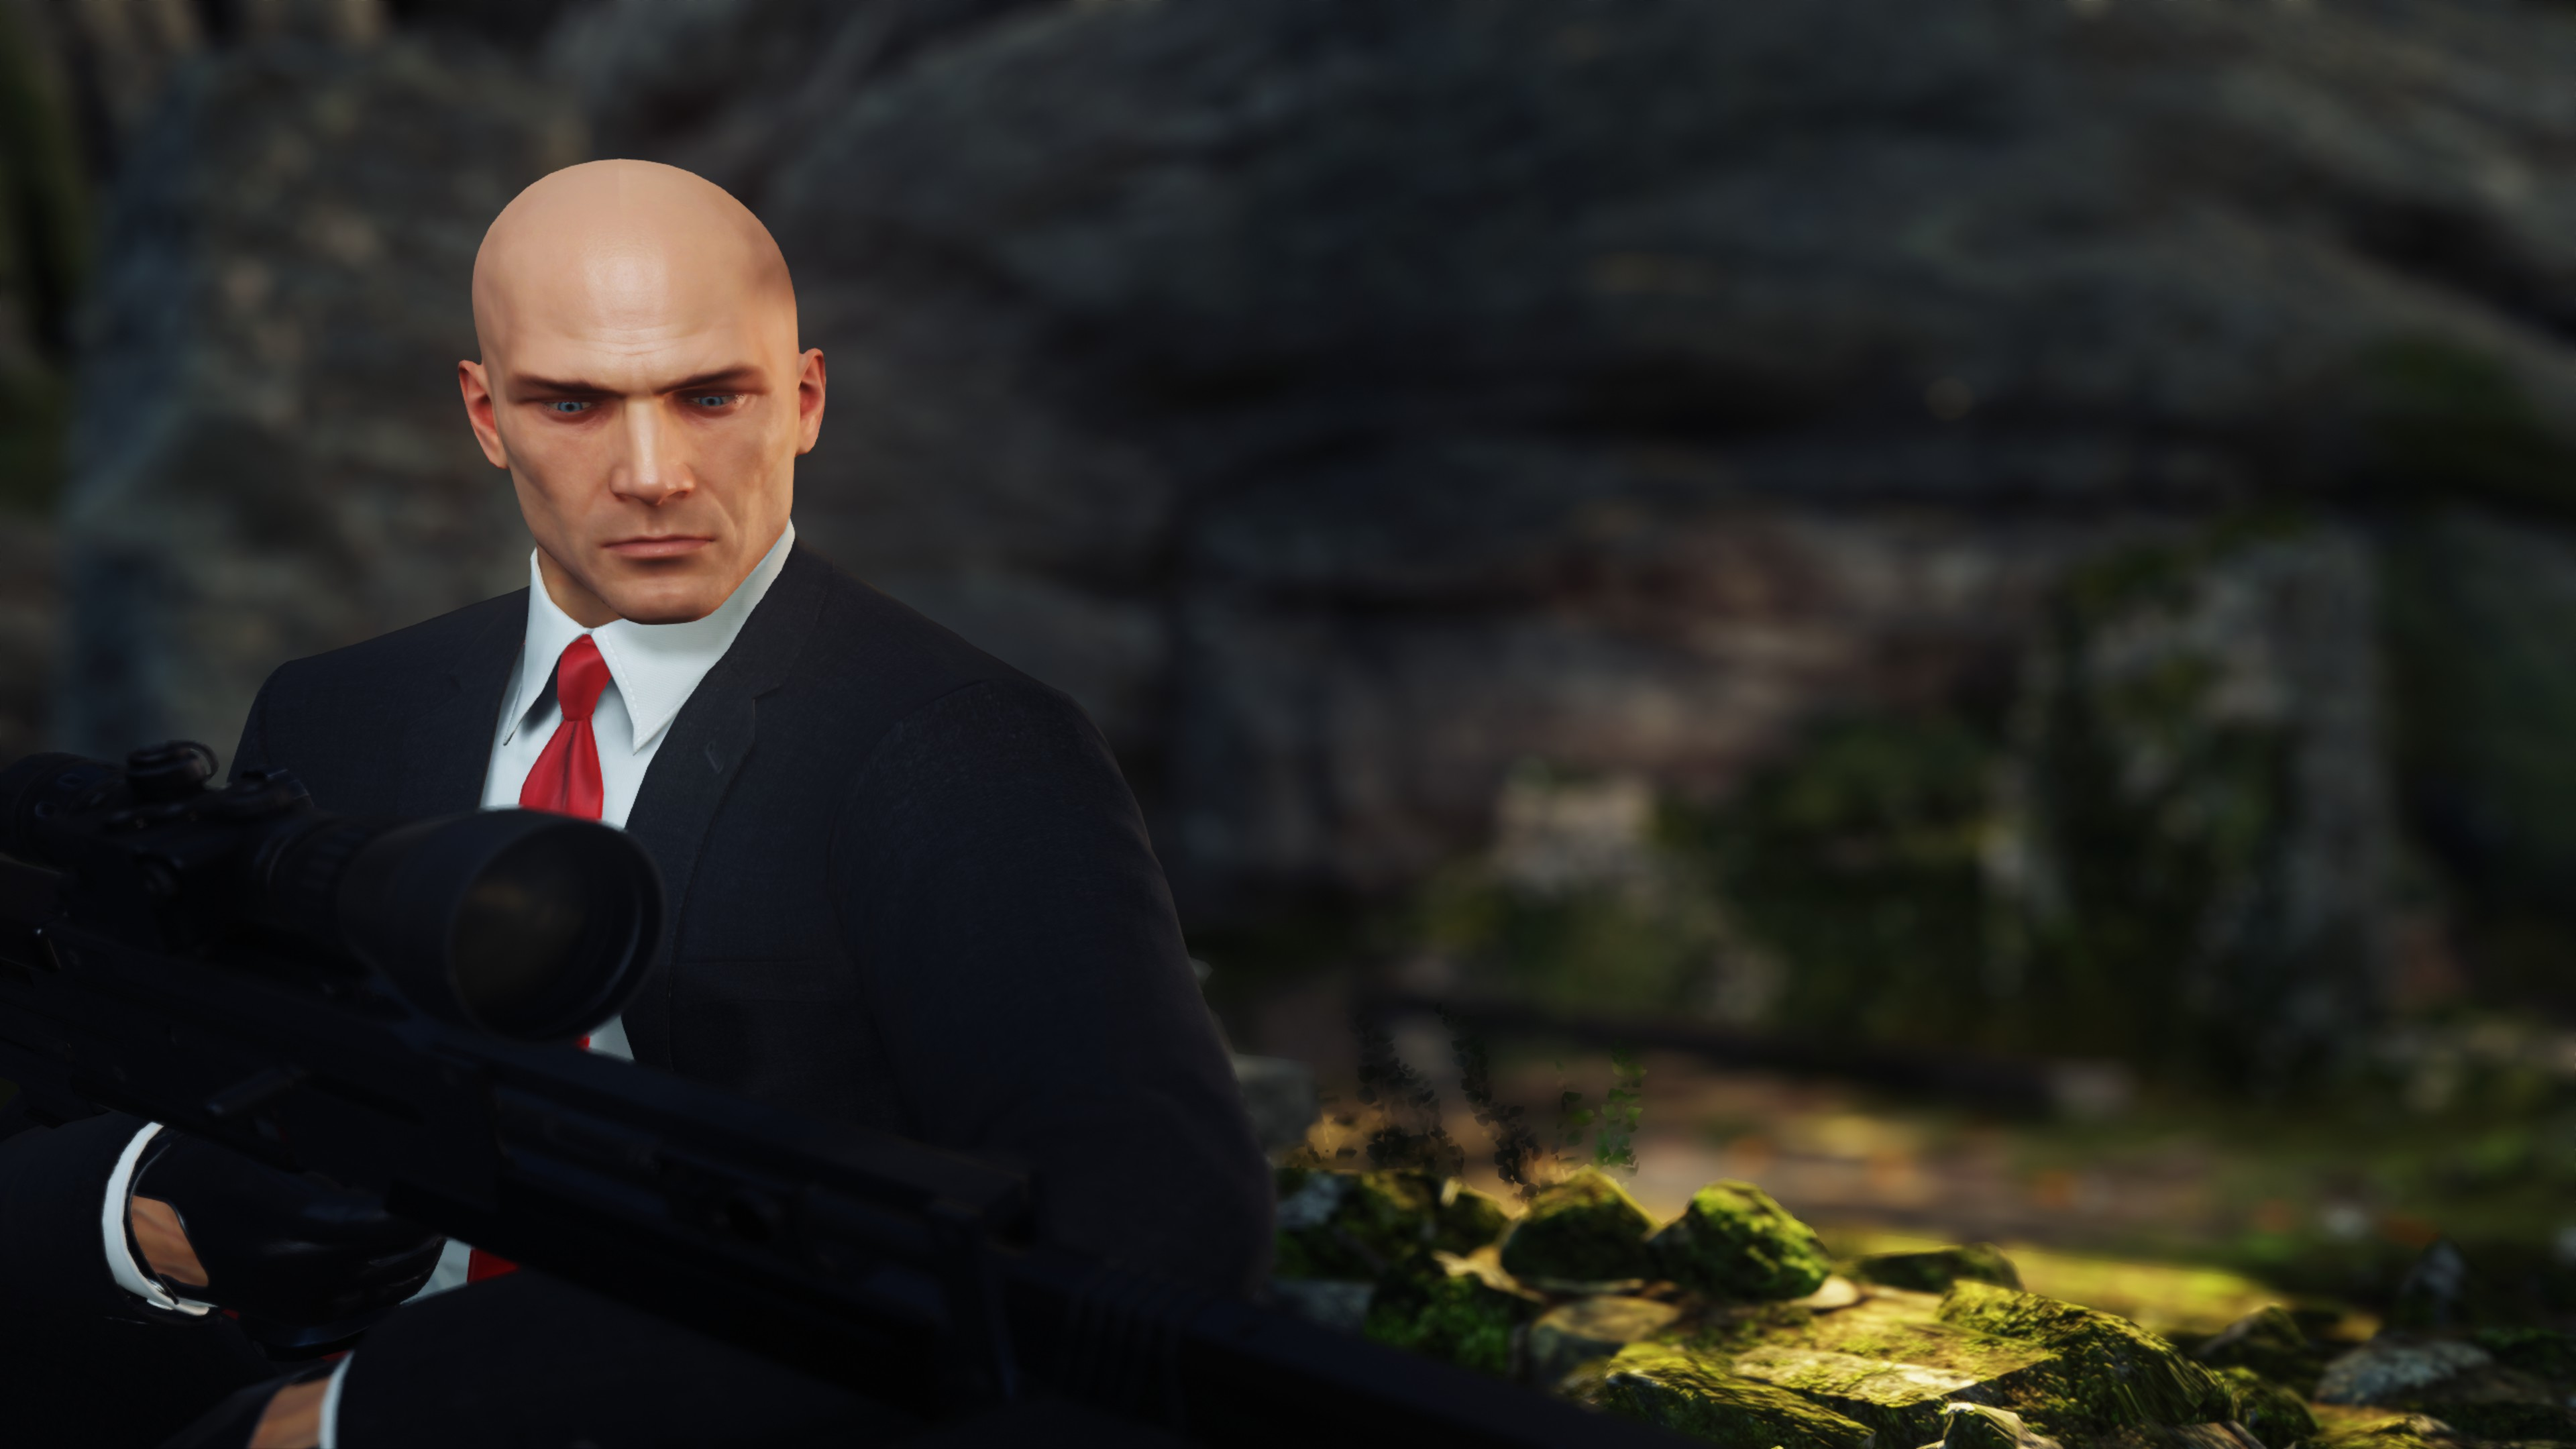 Agent 47 In Autria 2 Hitman Sniper Assassin 4k Ultra Hd Wallpaper Background Image 3840x2160 Id 947362